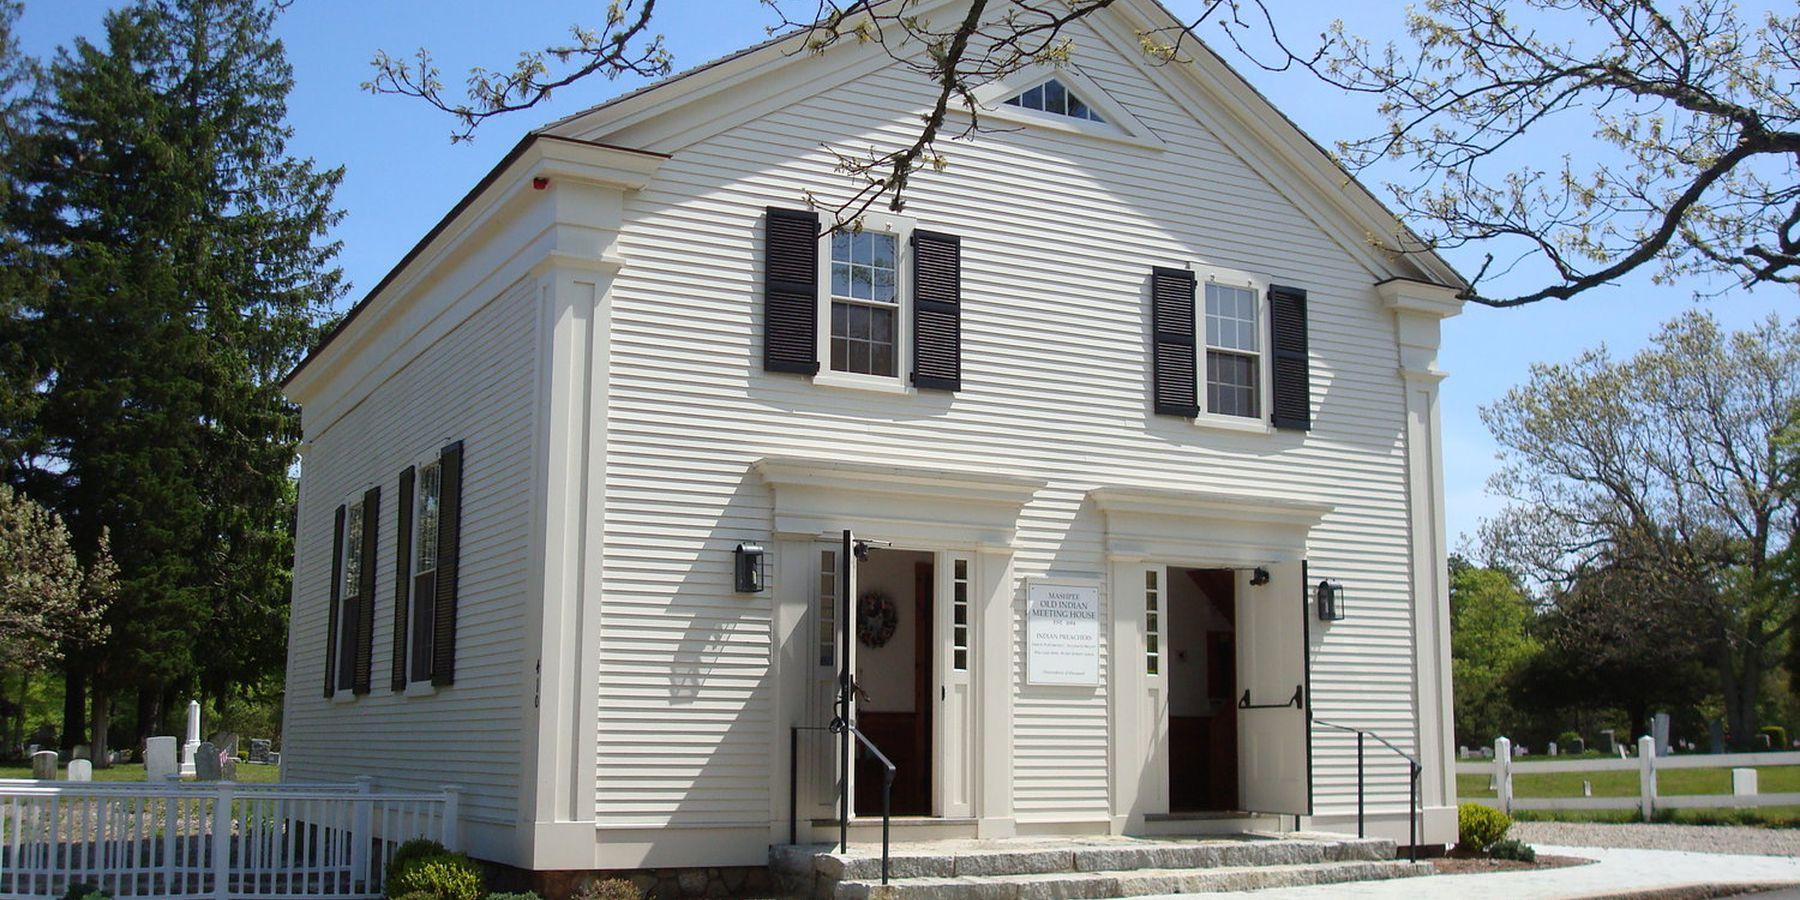 Old Indian Meeting House - Cape Cod - Massachusetts - Doets Reizen